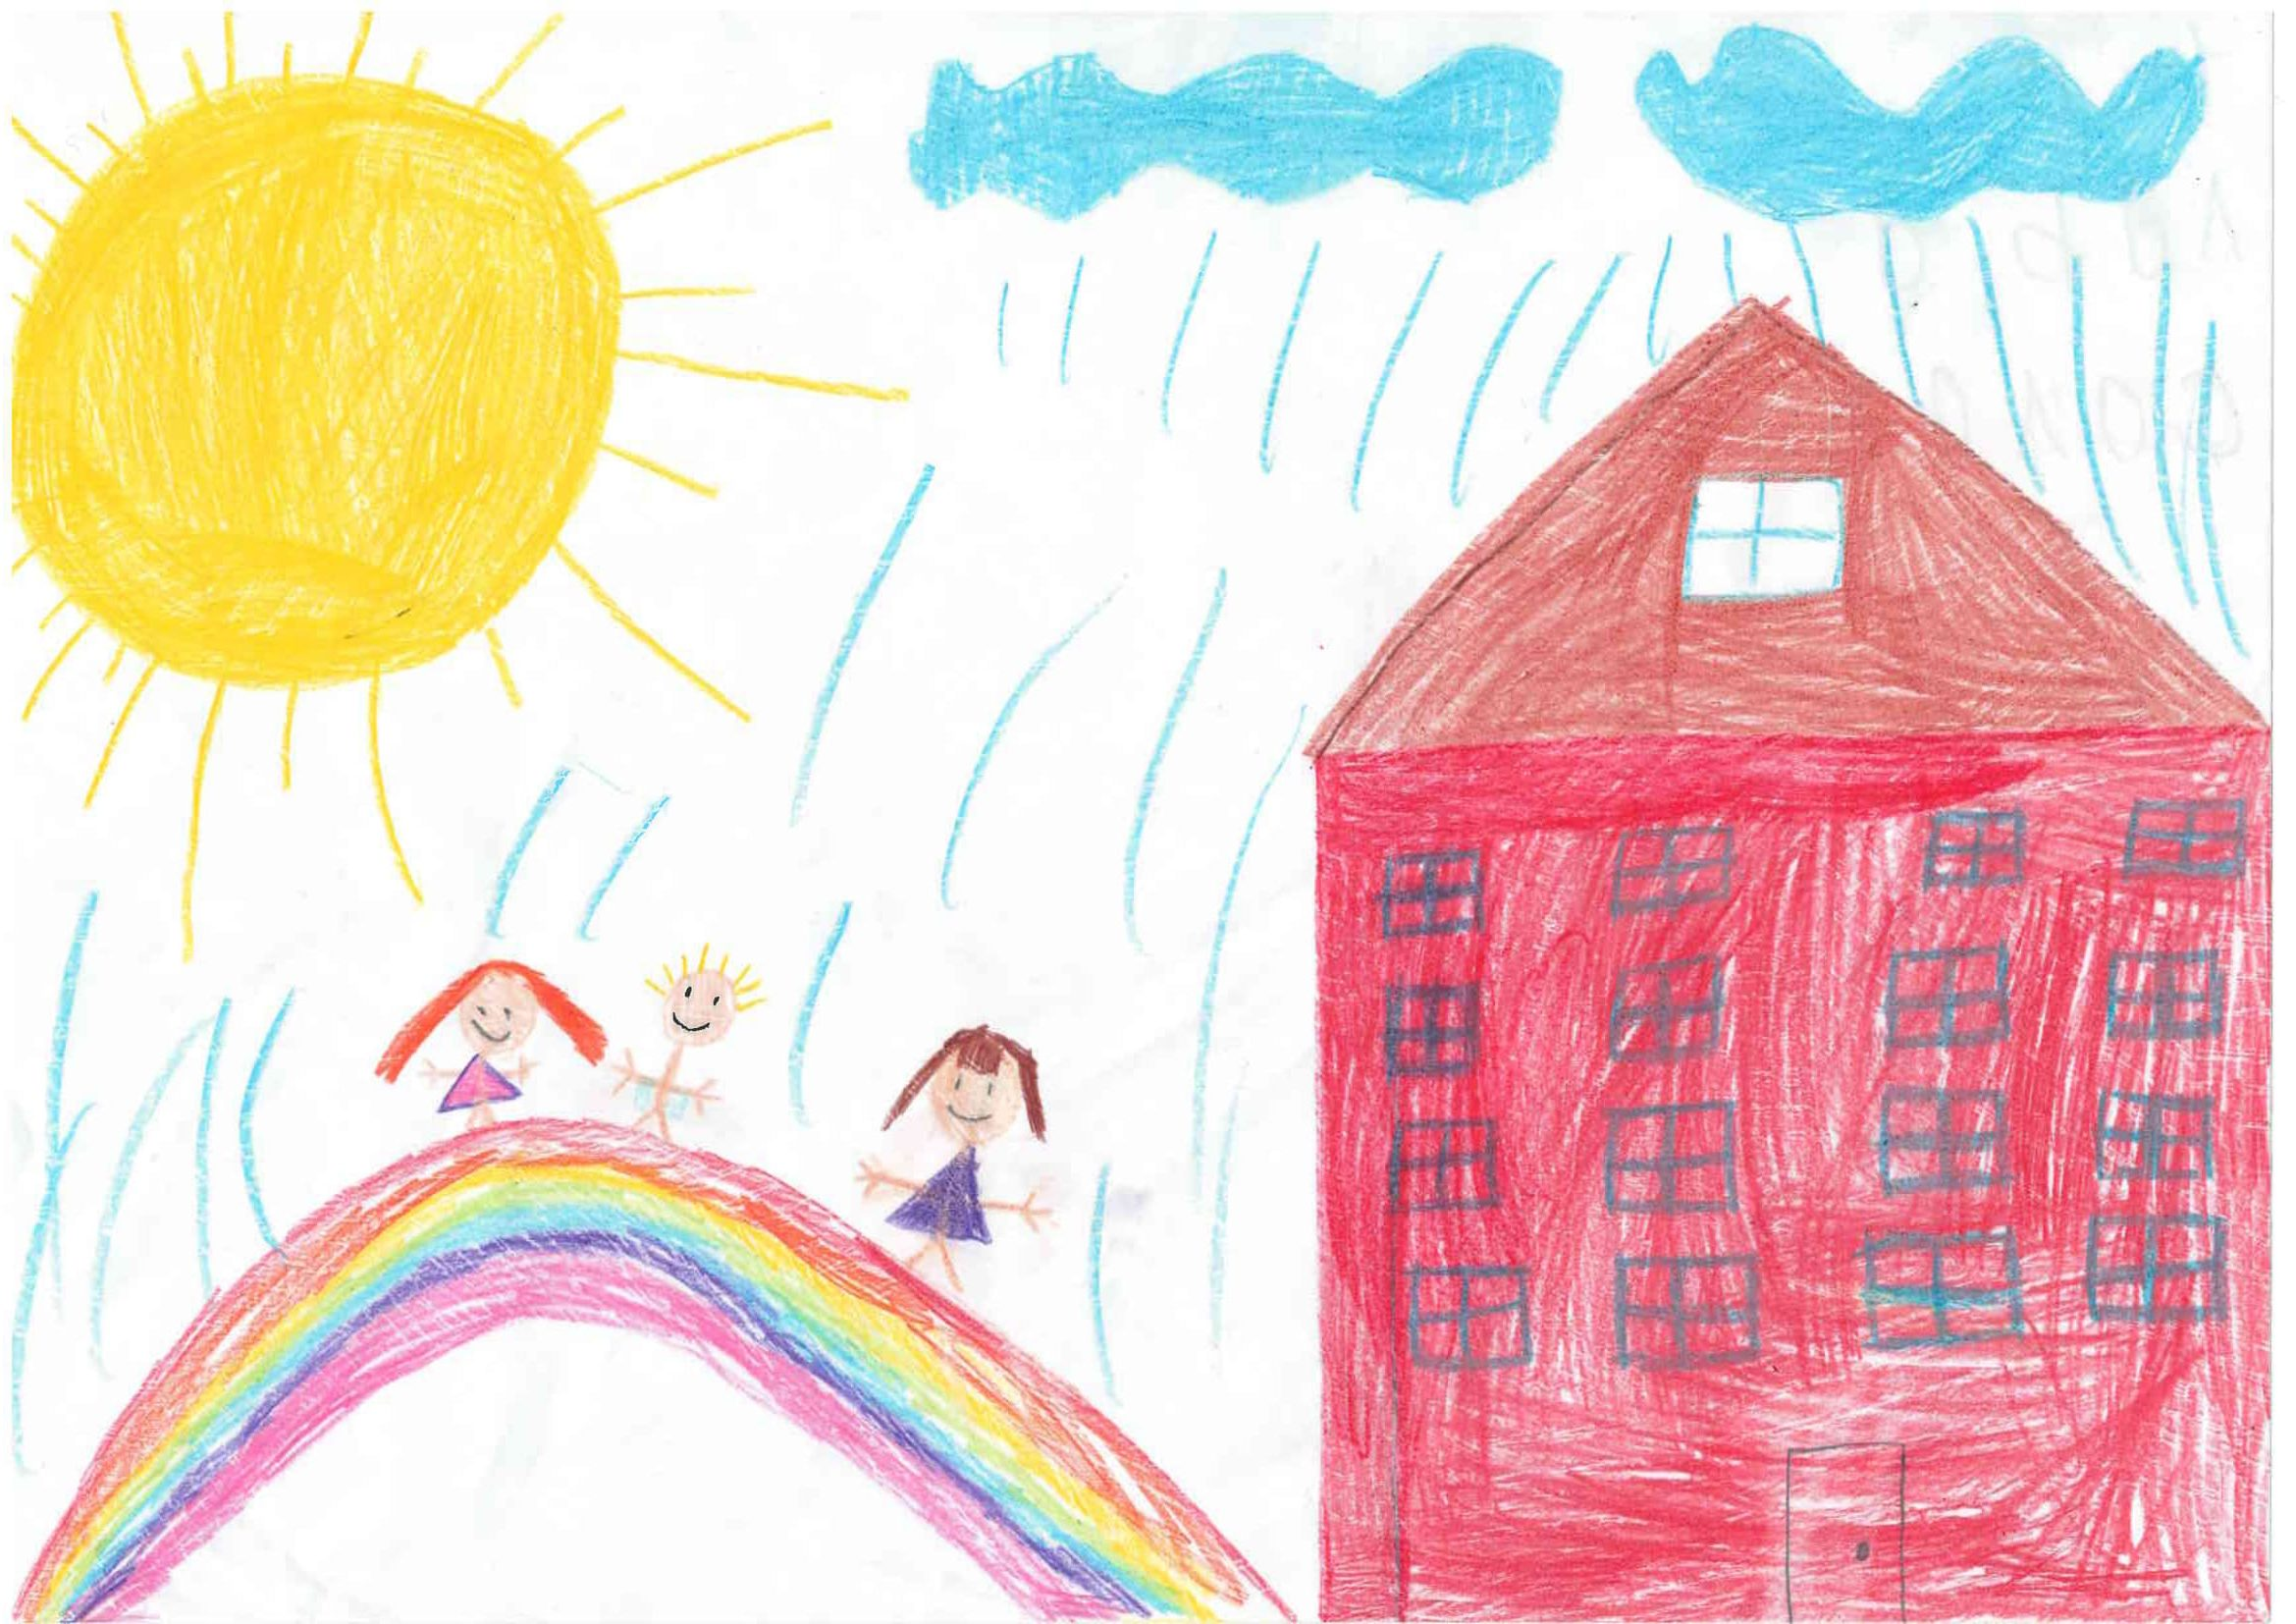 Украинскому активисту Владимиру Балуху дети написали письма поддержки